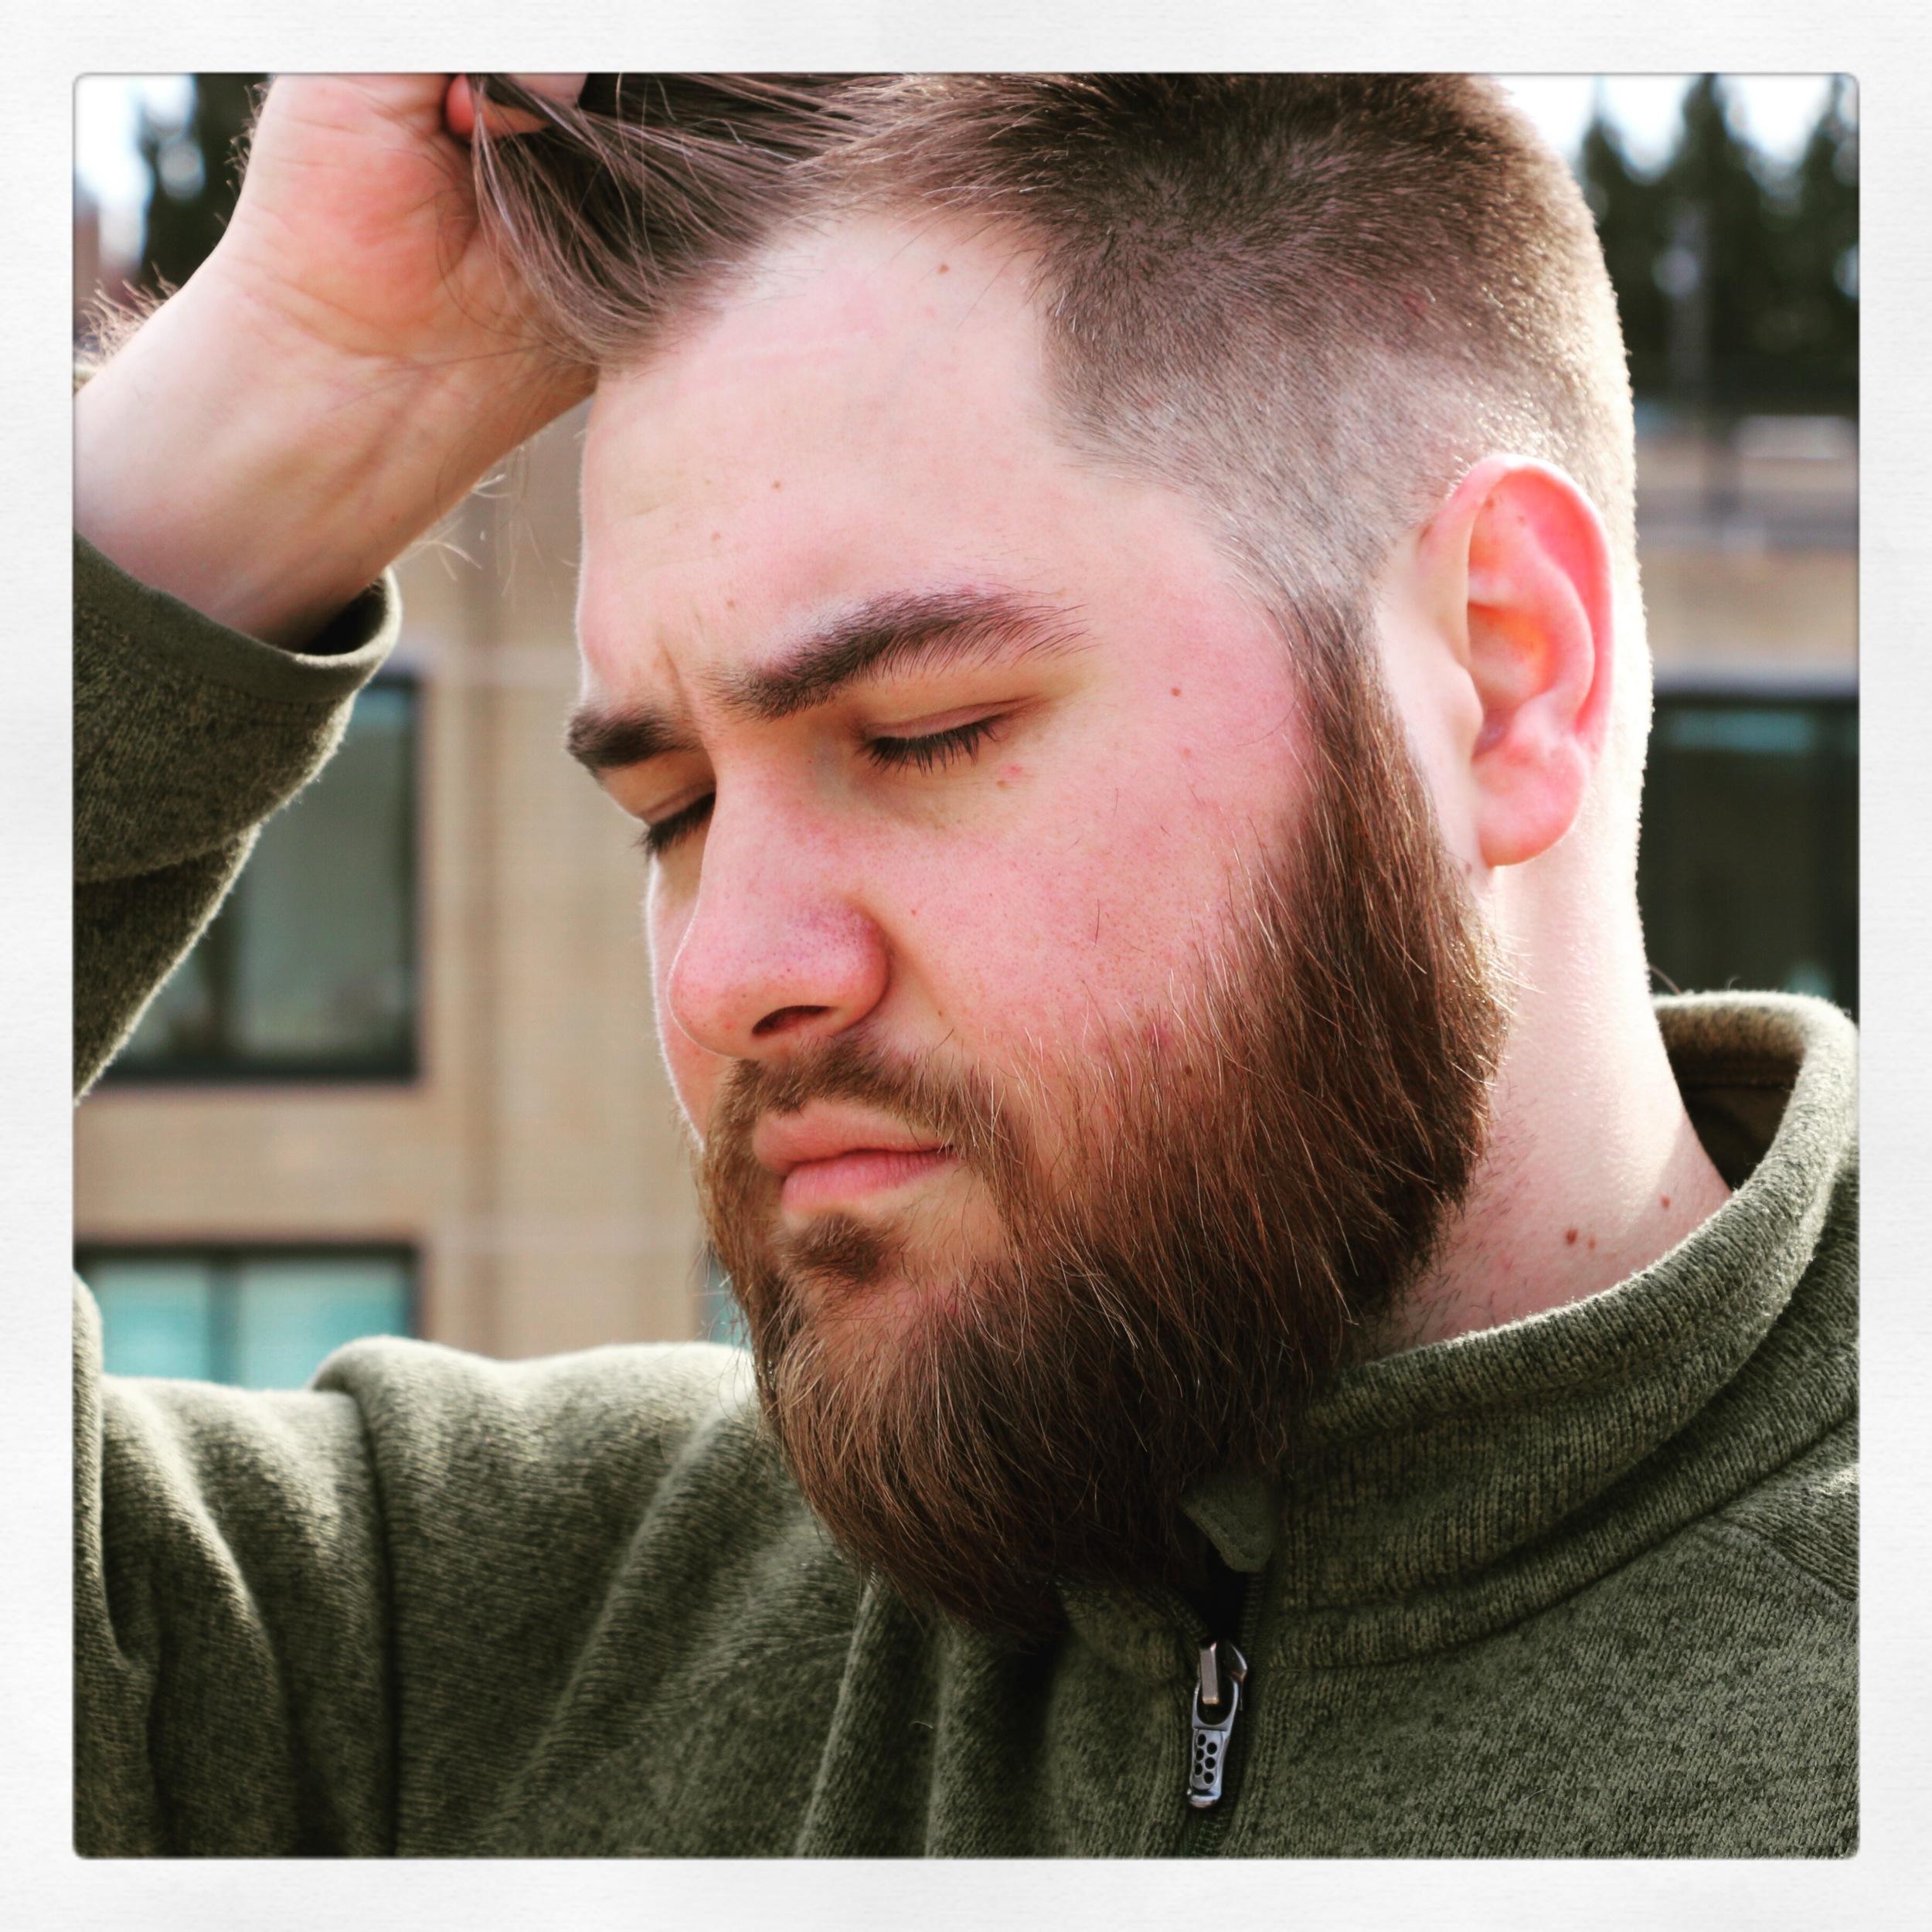 Beard got me like...